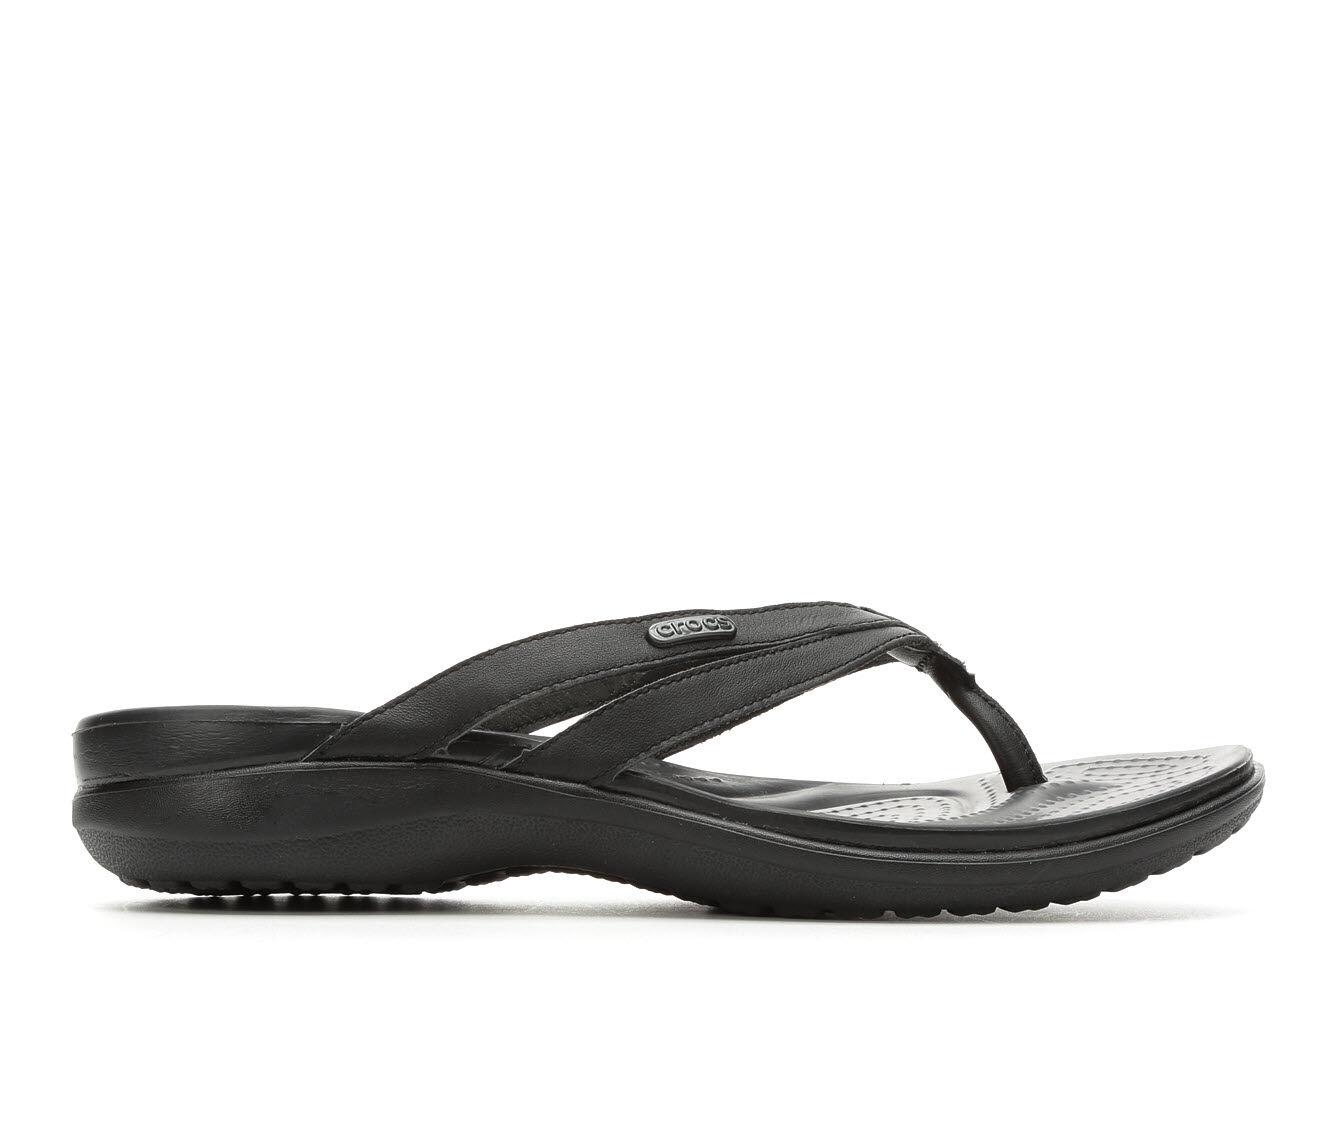 Women's Crocs Capri Strappy Flip-Flop Black/Black